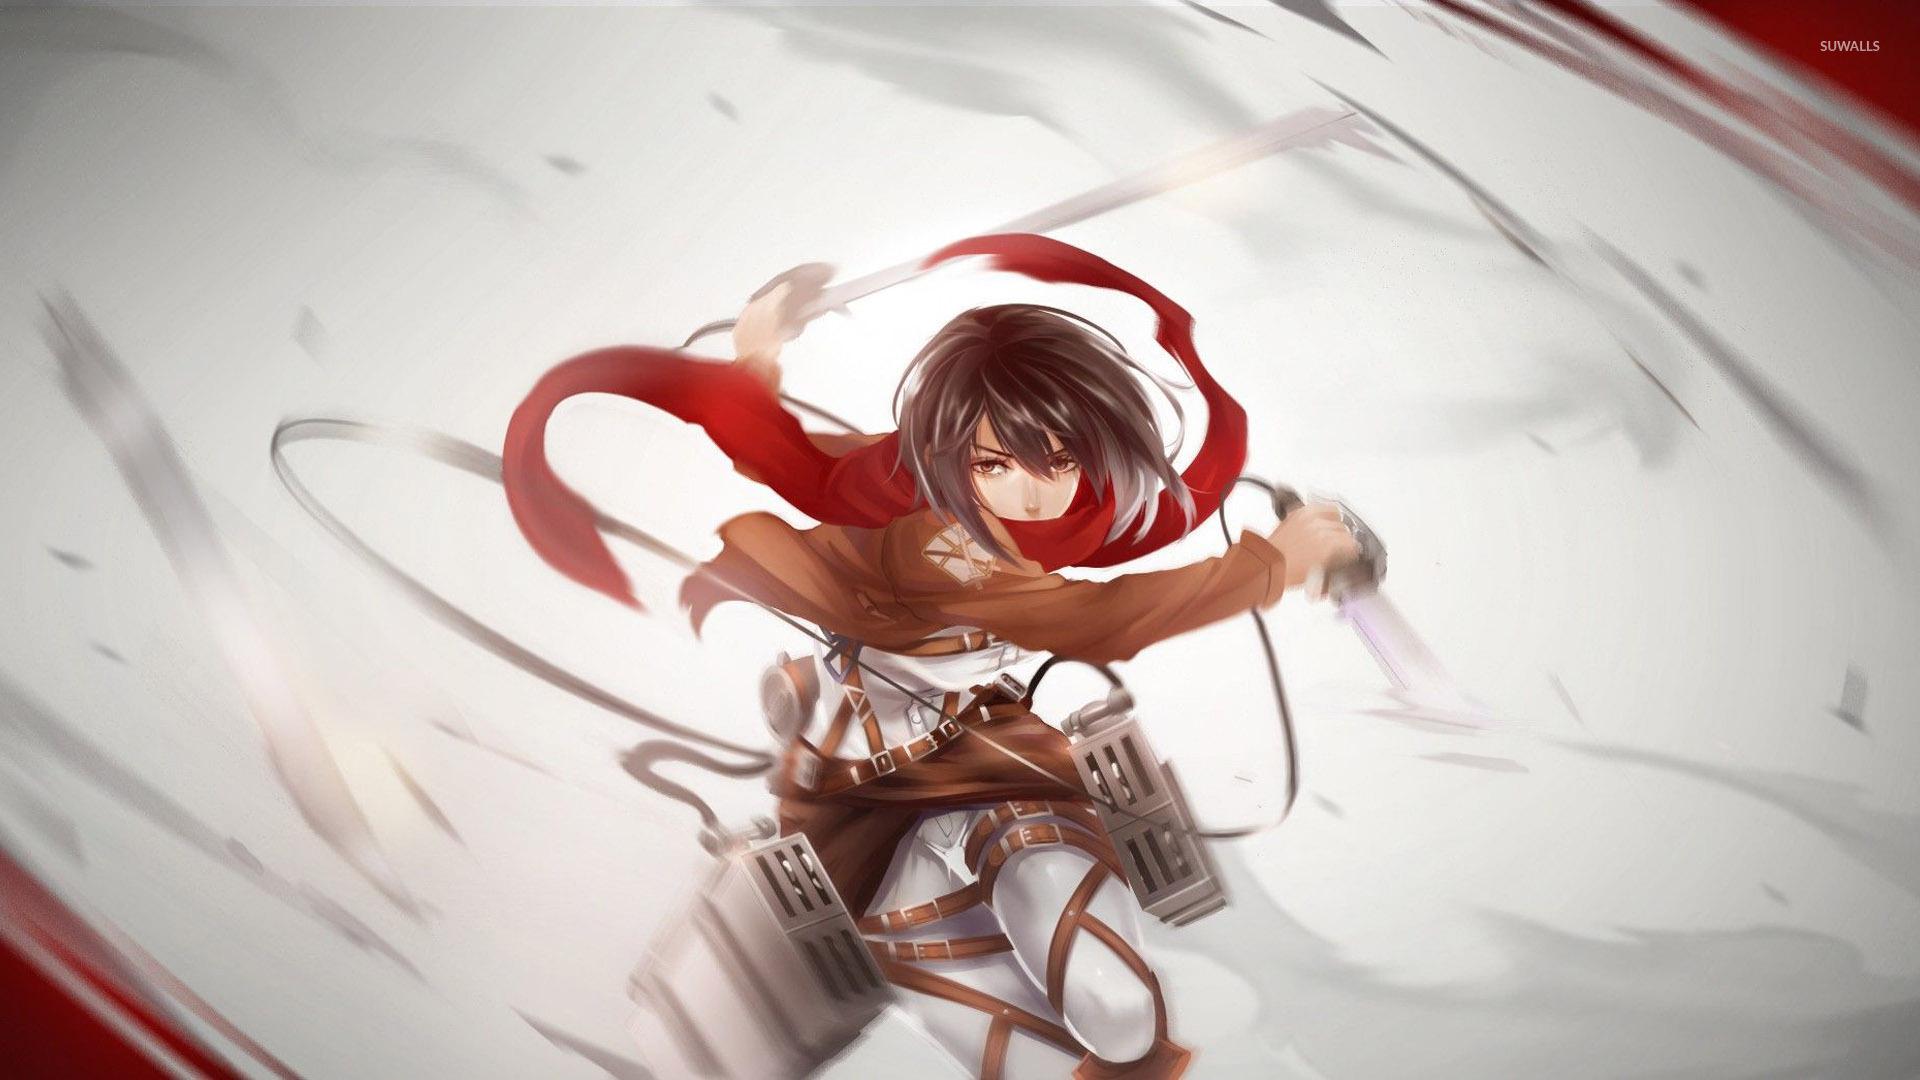 Anime Wallpaper Attack On Titan Mikasa - HD Wallpaper